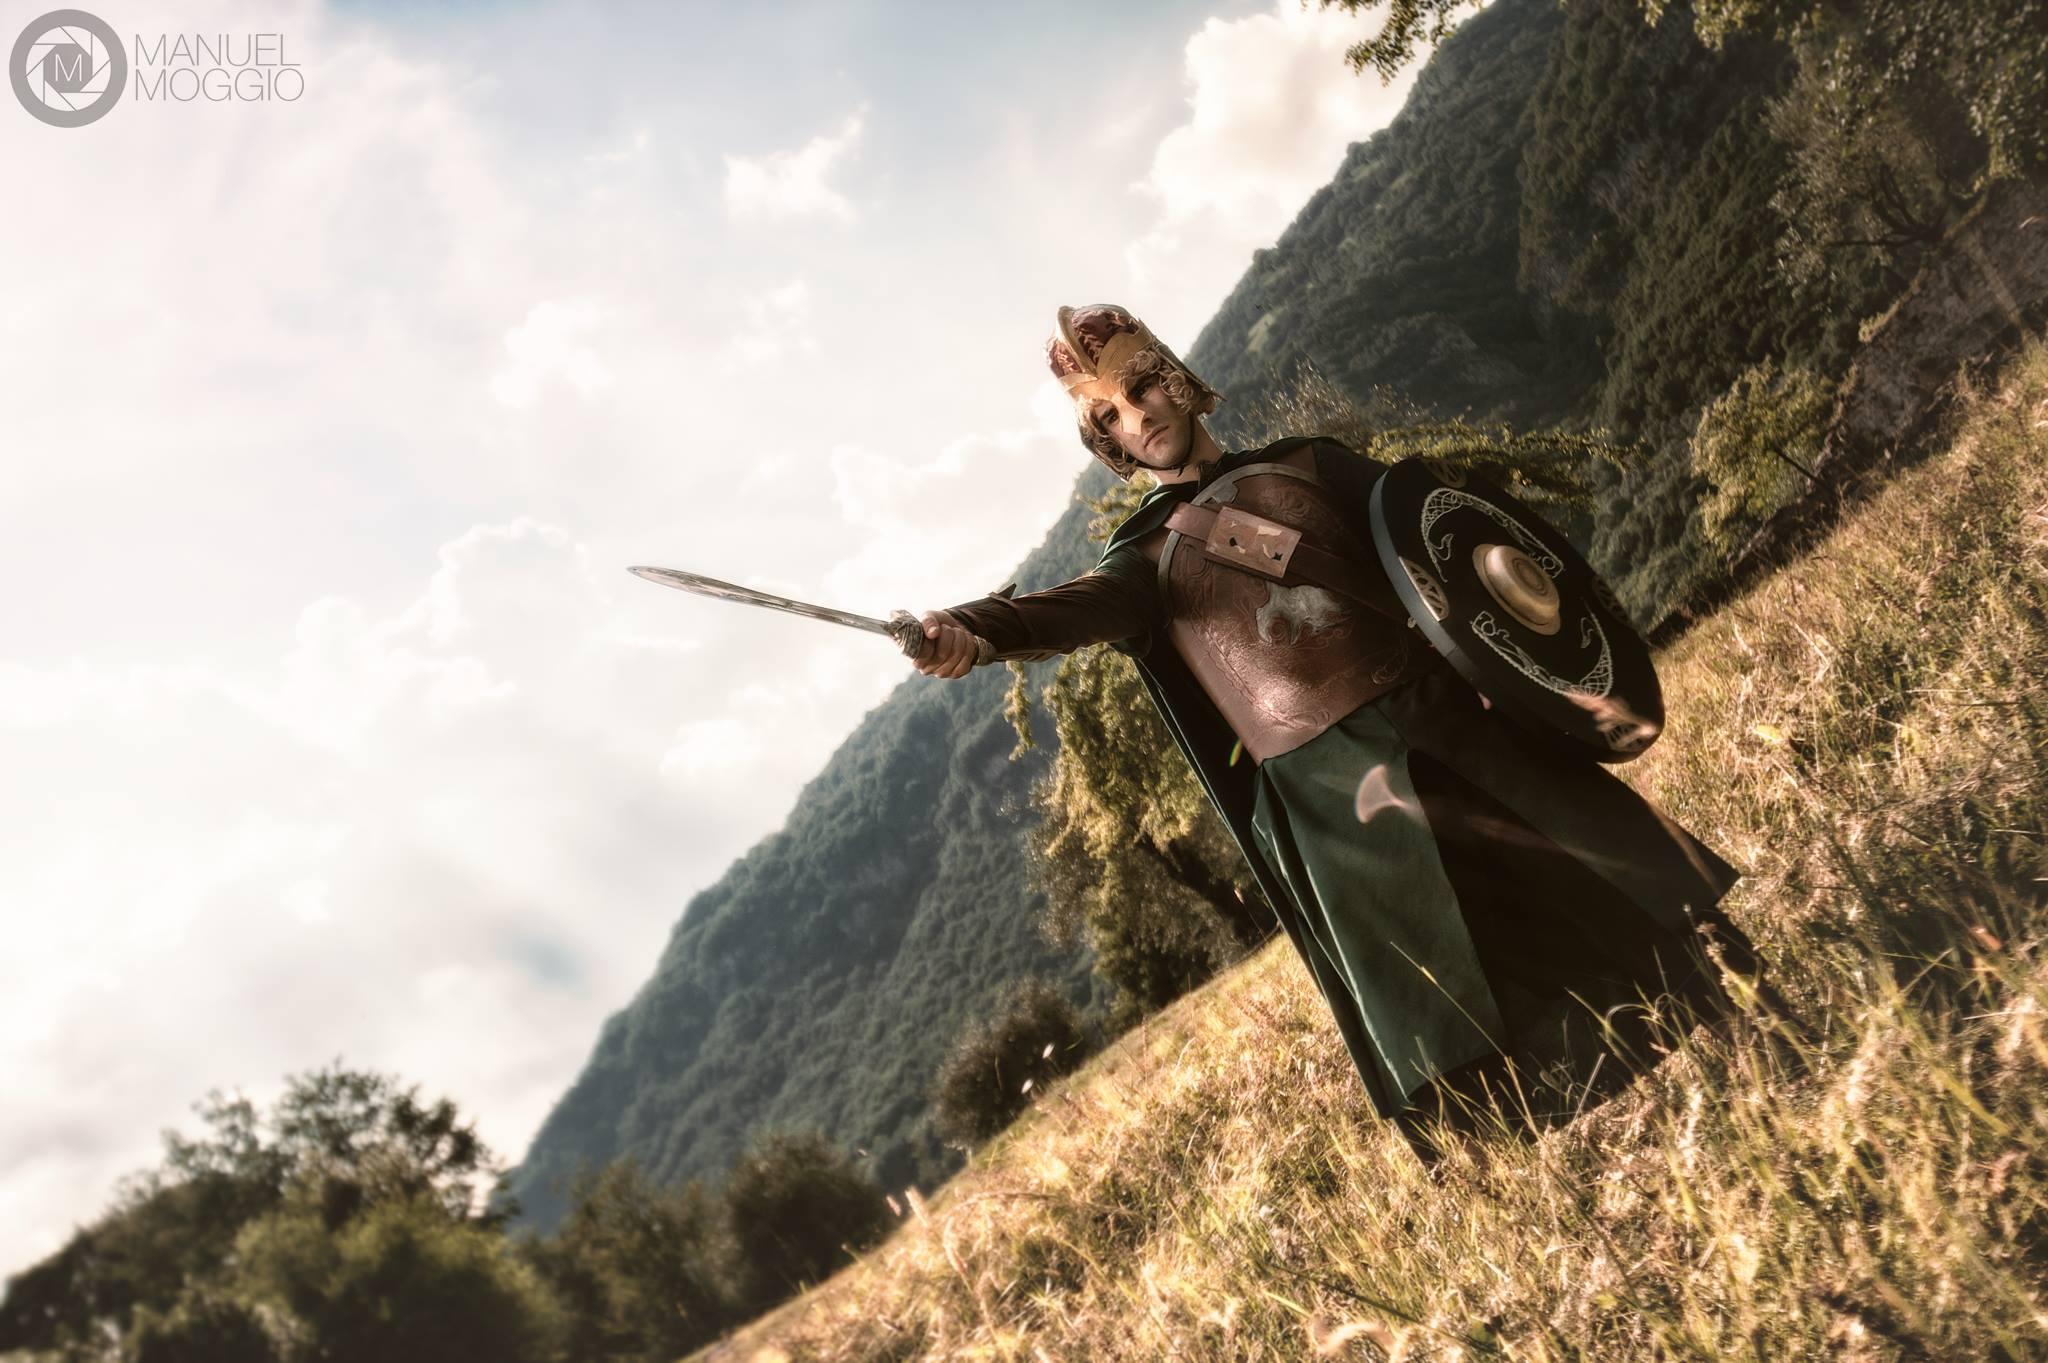 La Quarta Era - Razze - Hobbit - Meriadoc Brandibuck